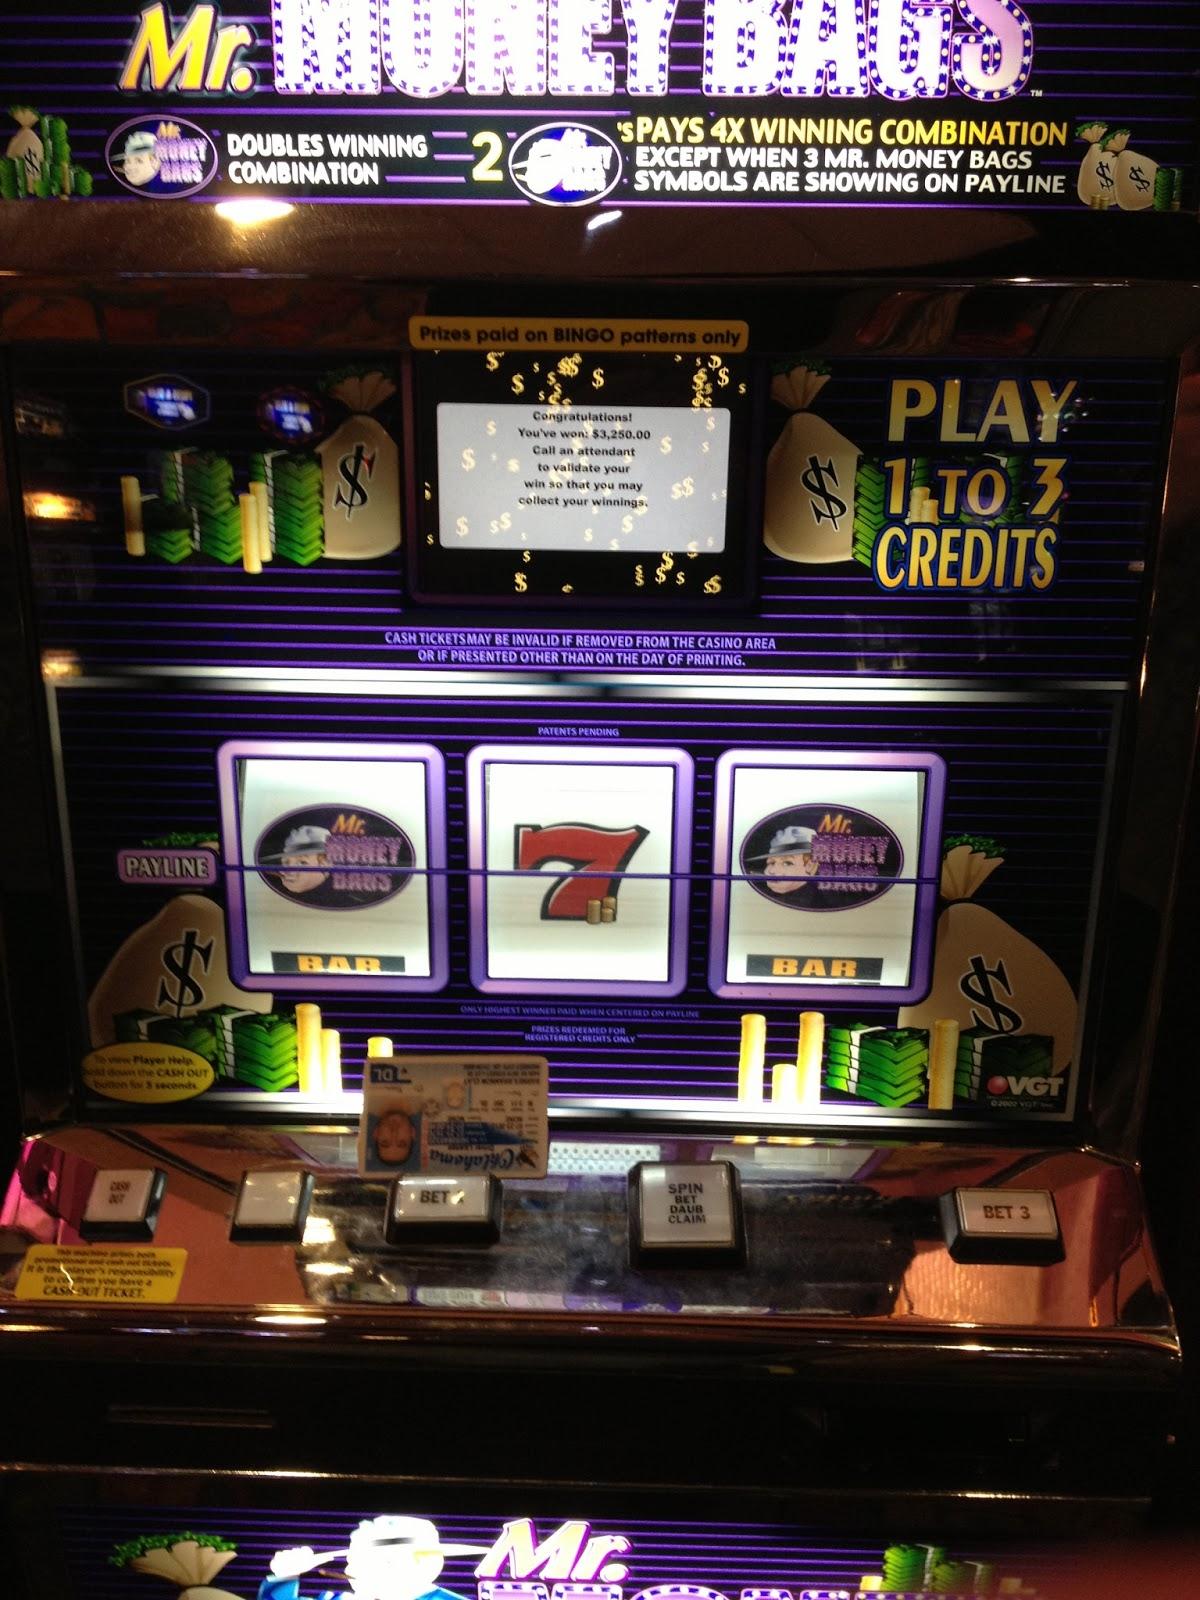 770% First deposit bonus at 888 Casino